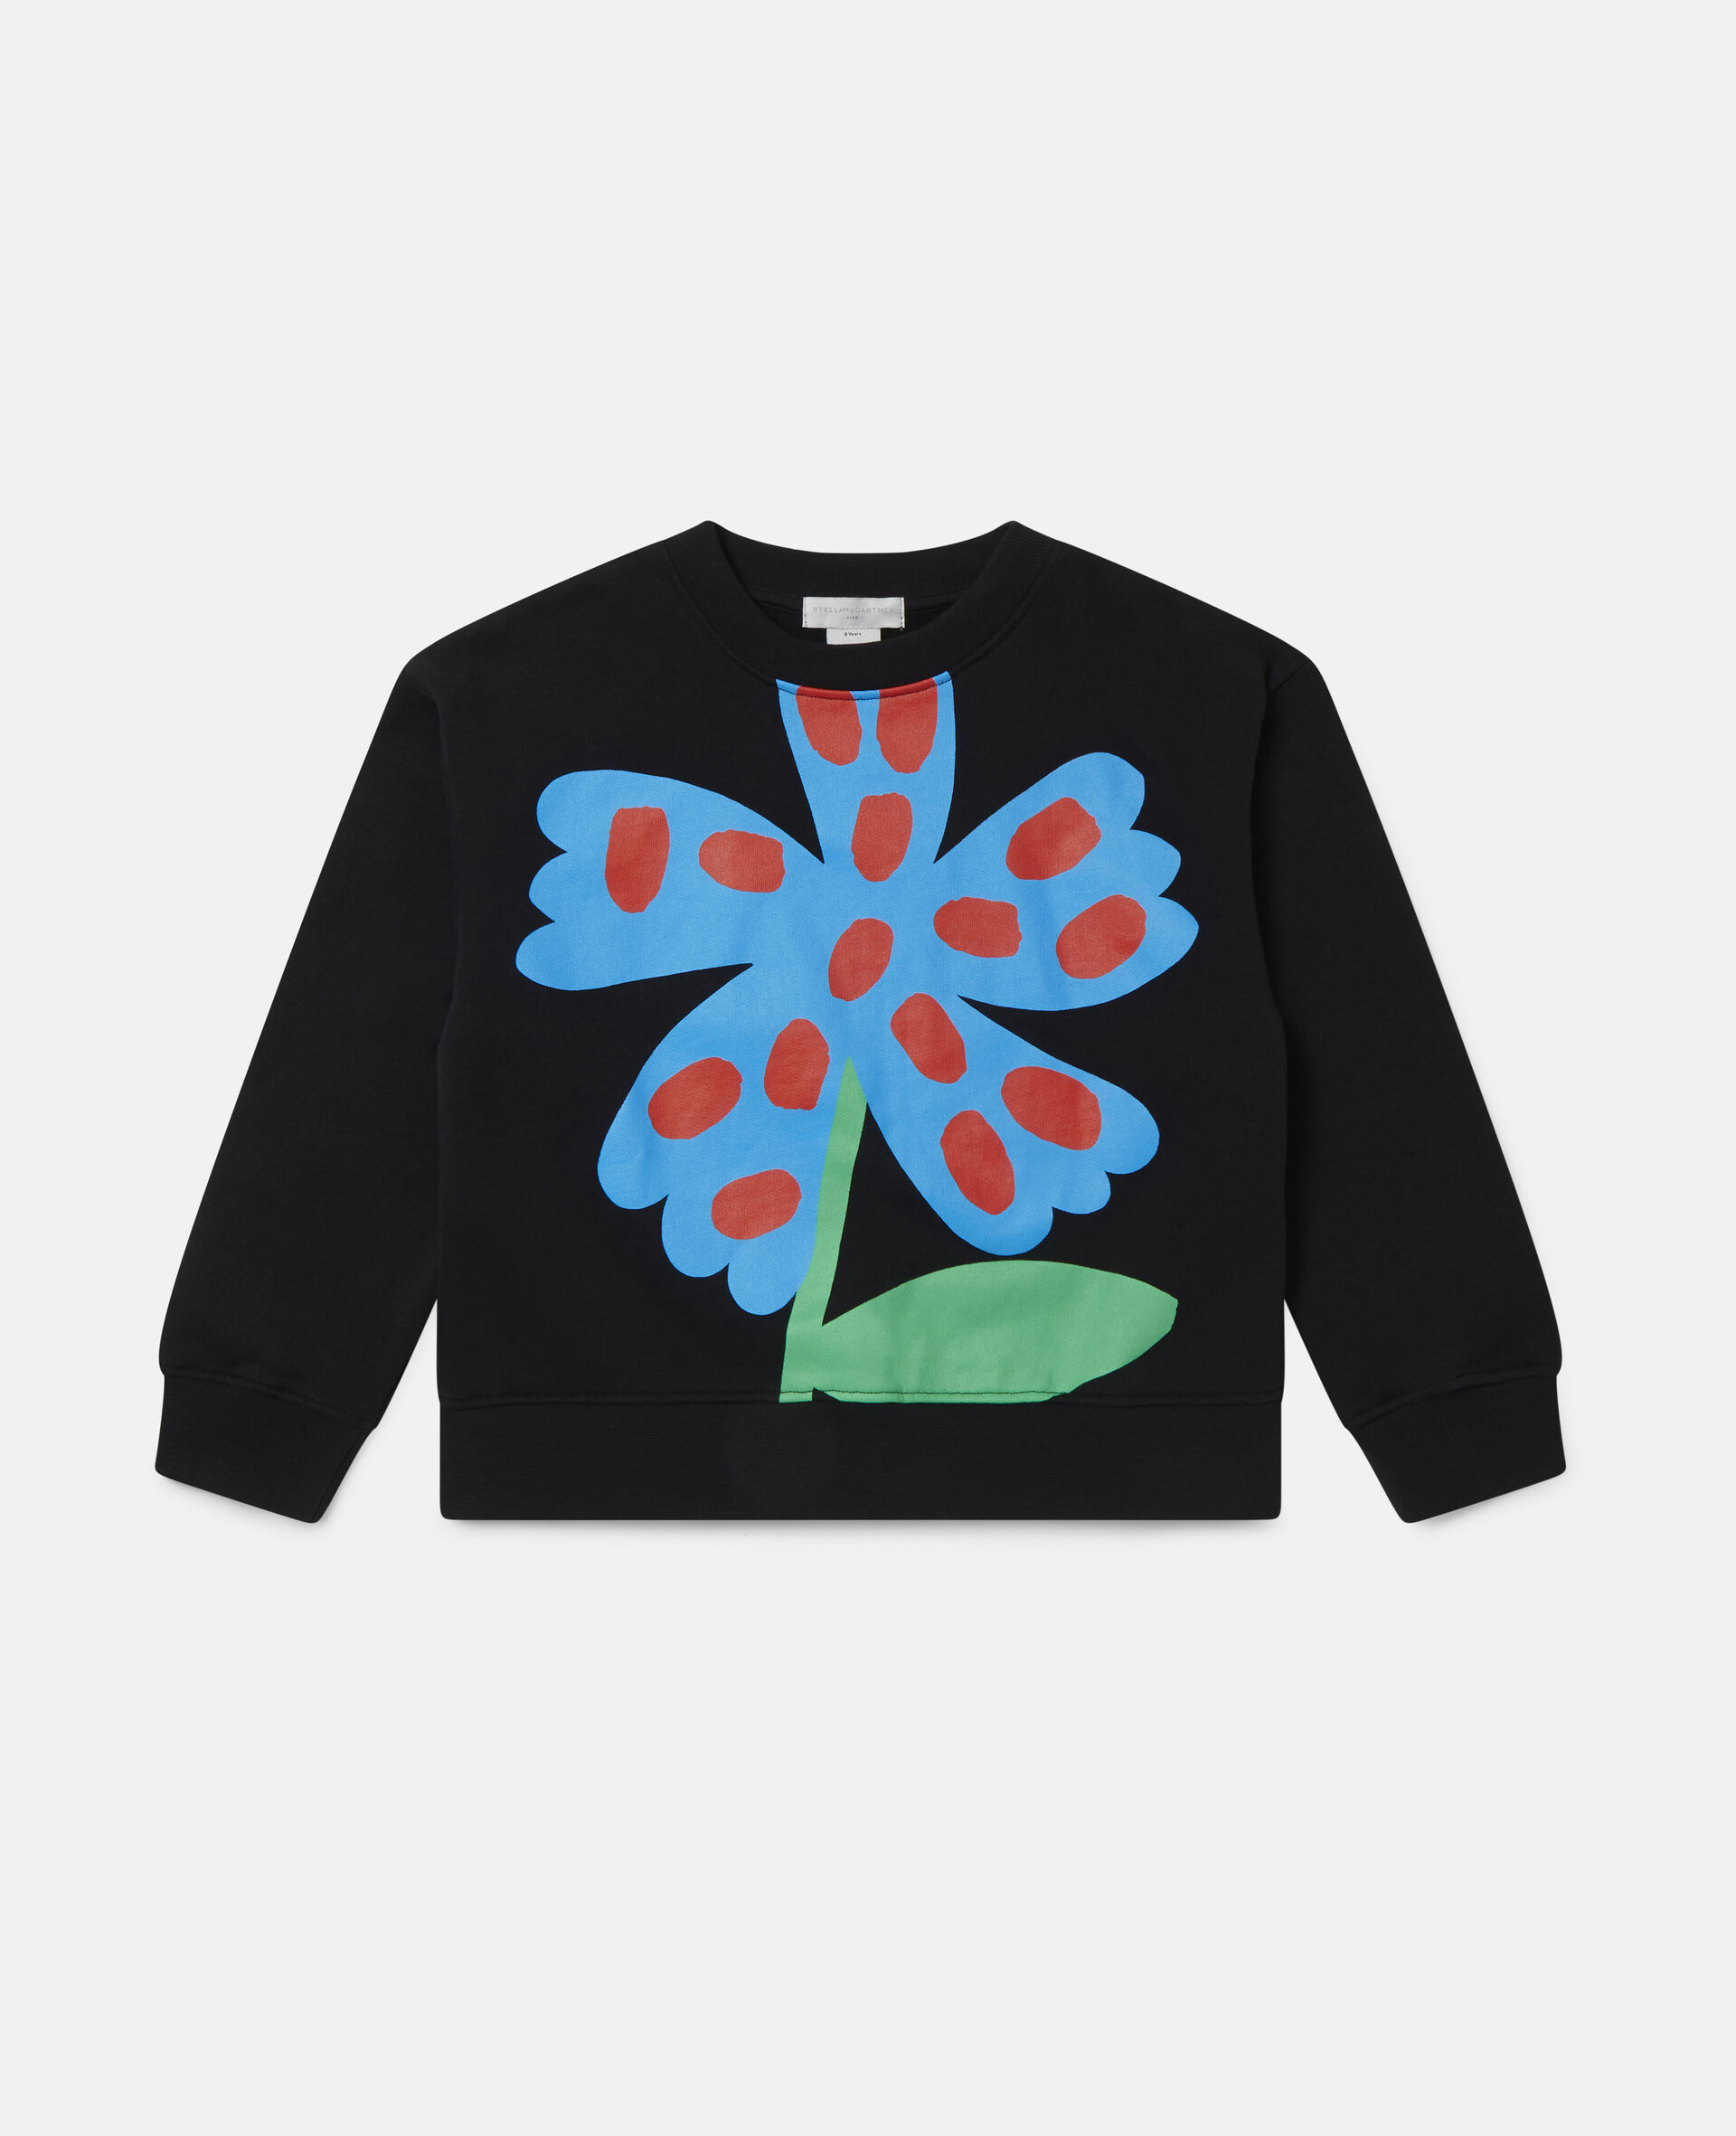 Spotty Flower Oversize Cotton Fleece Sweatshirt-Black-large image number 0